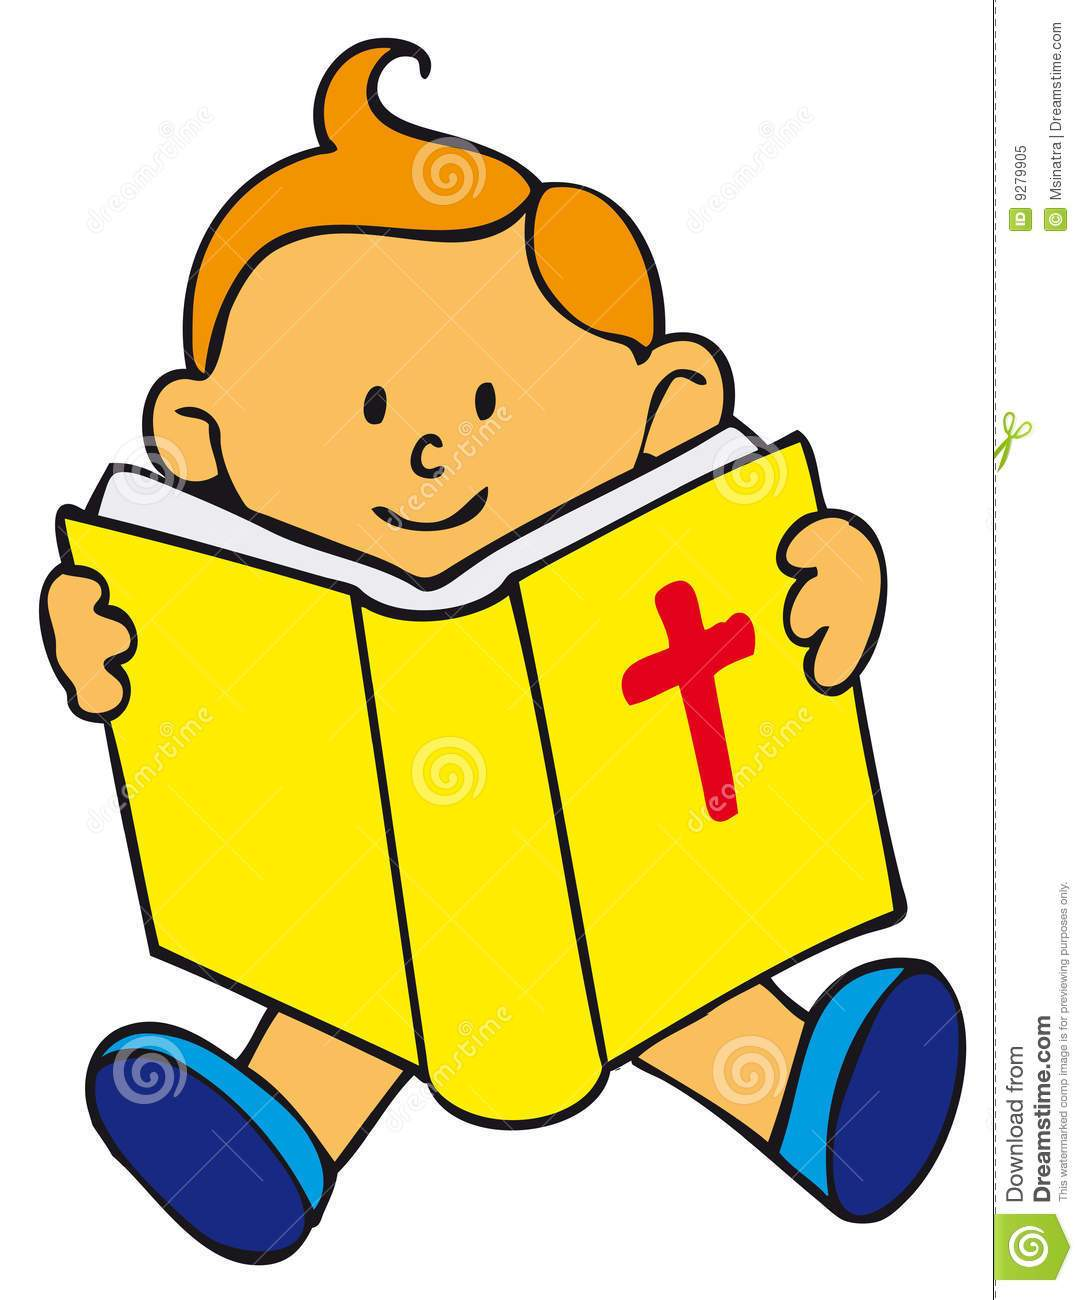 Bible kids clipart jpg freeuse stock Bible clipart for kids 4 » Clipart Portal jpg freeuse stock